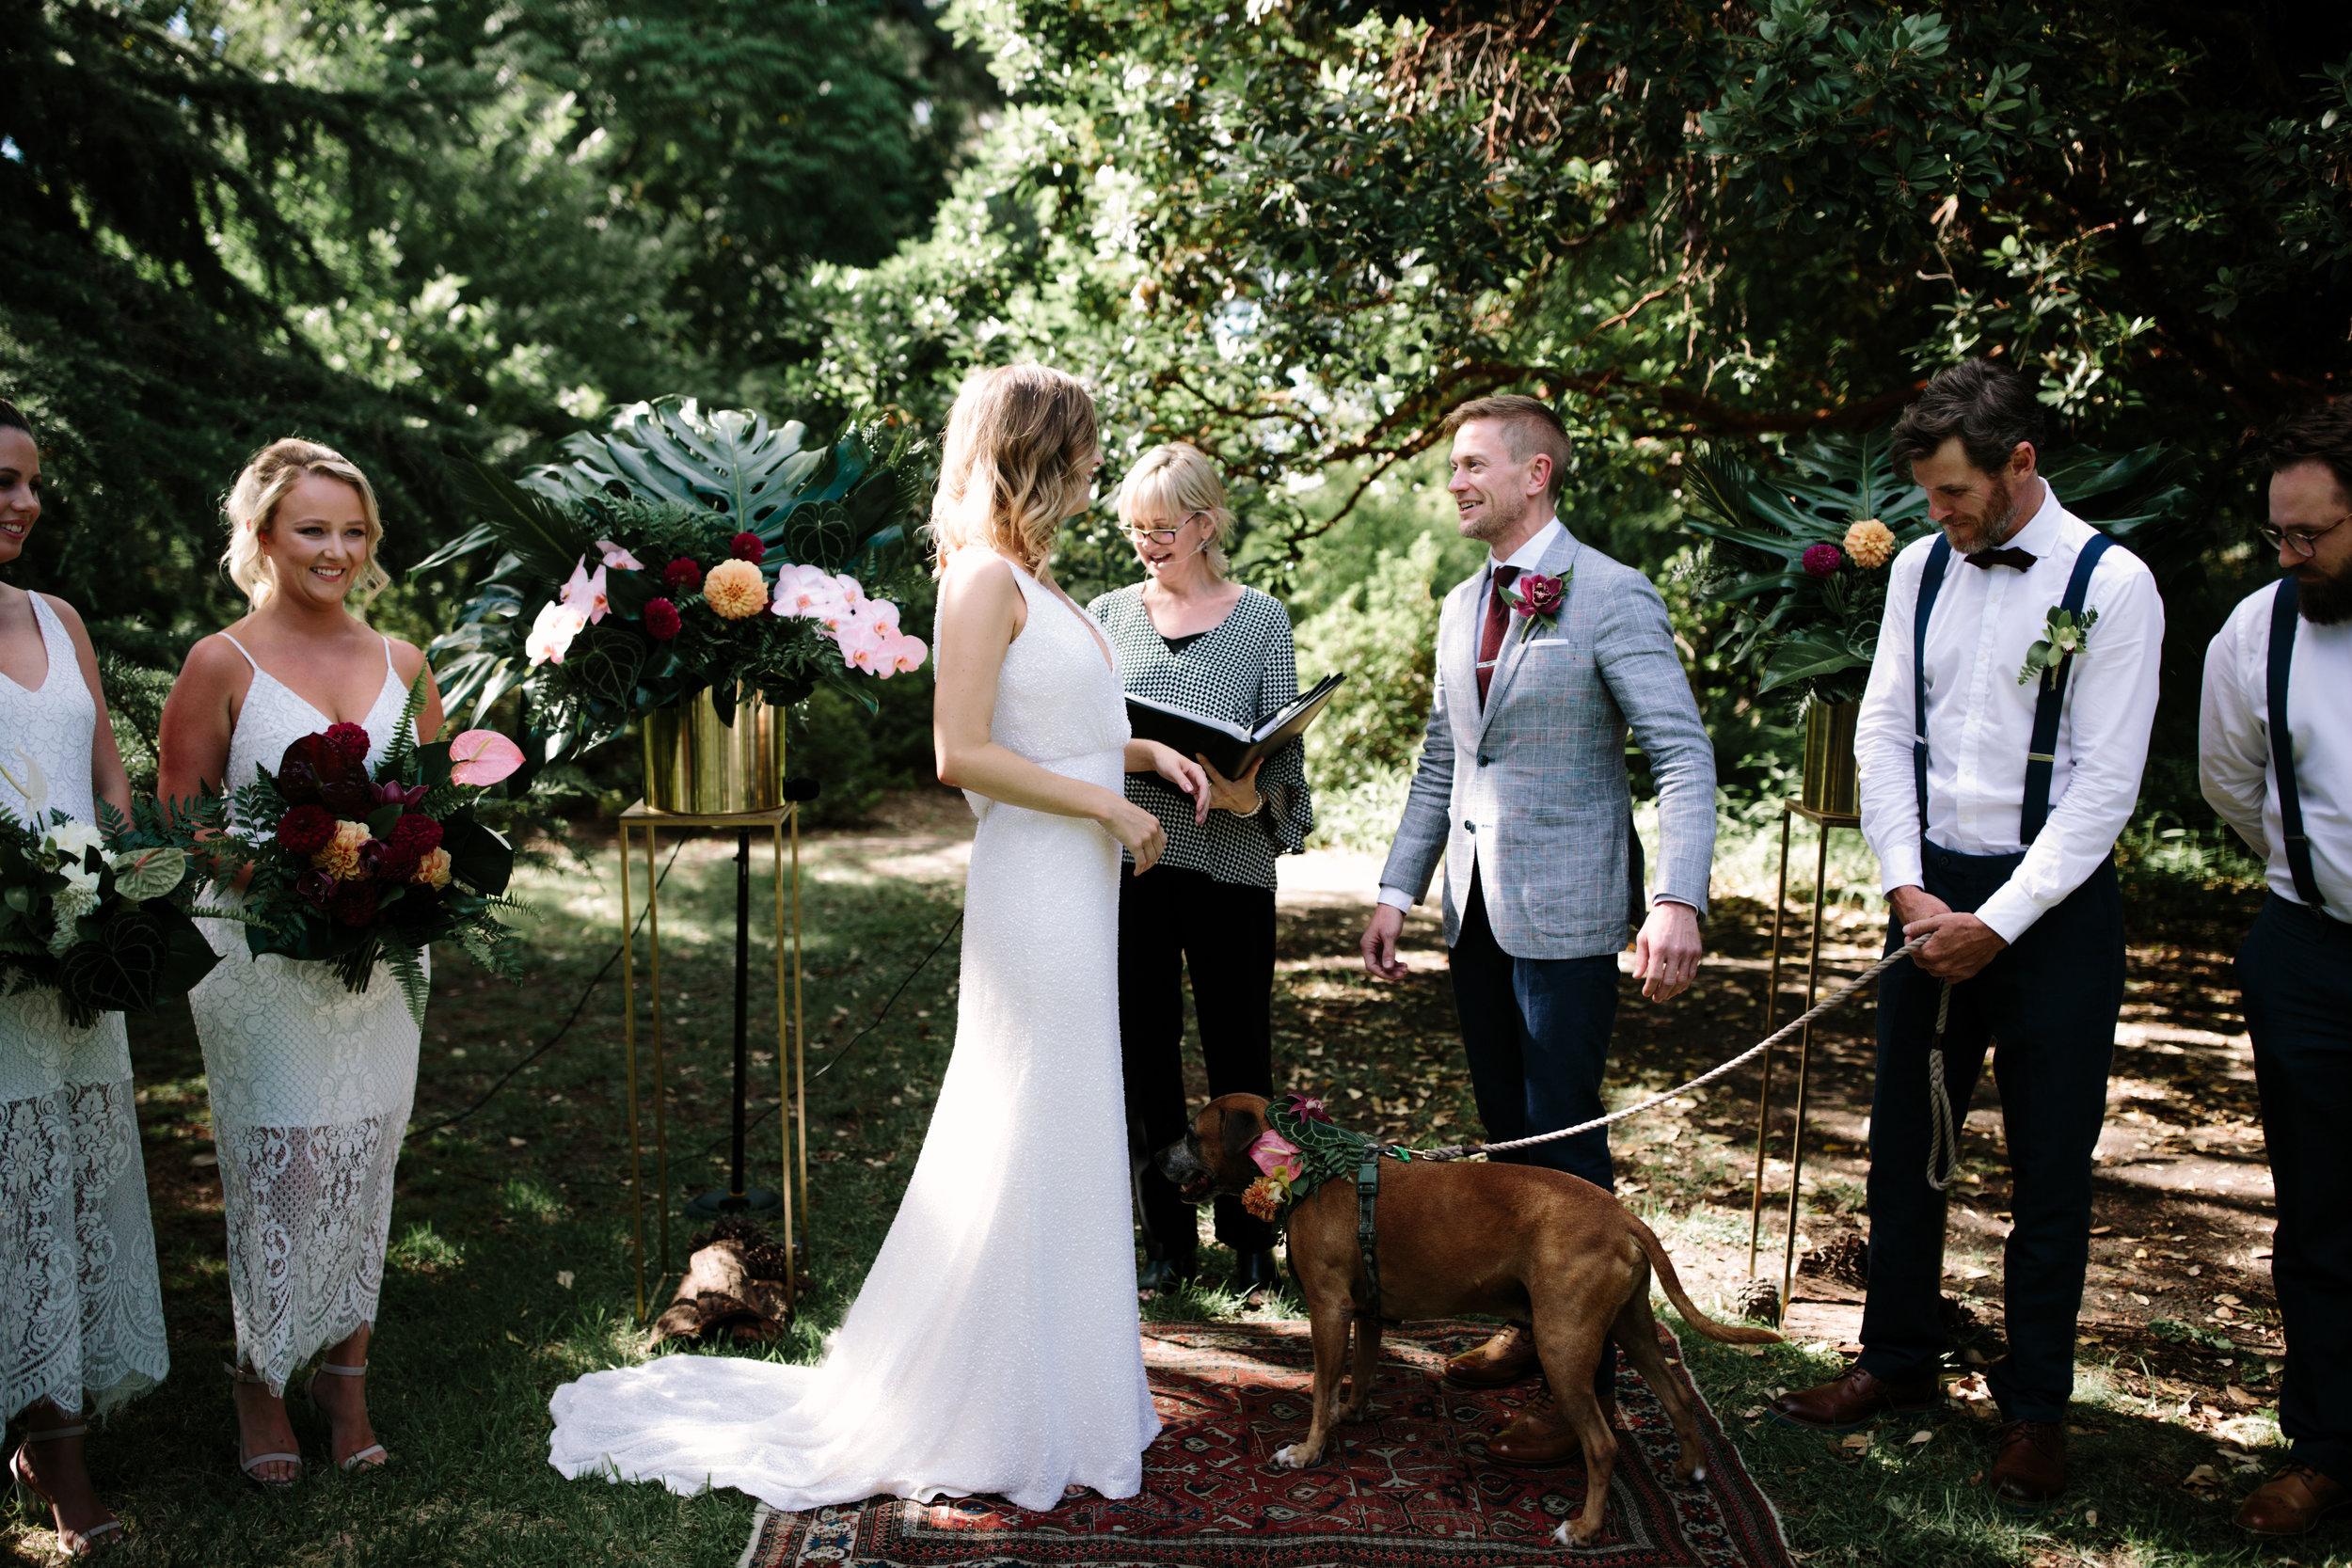 I-Got-You-Babe-Weddings-Candice-Simon0276.JPG